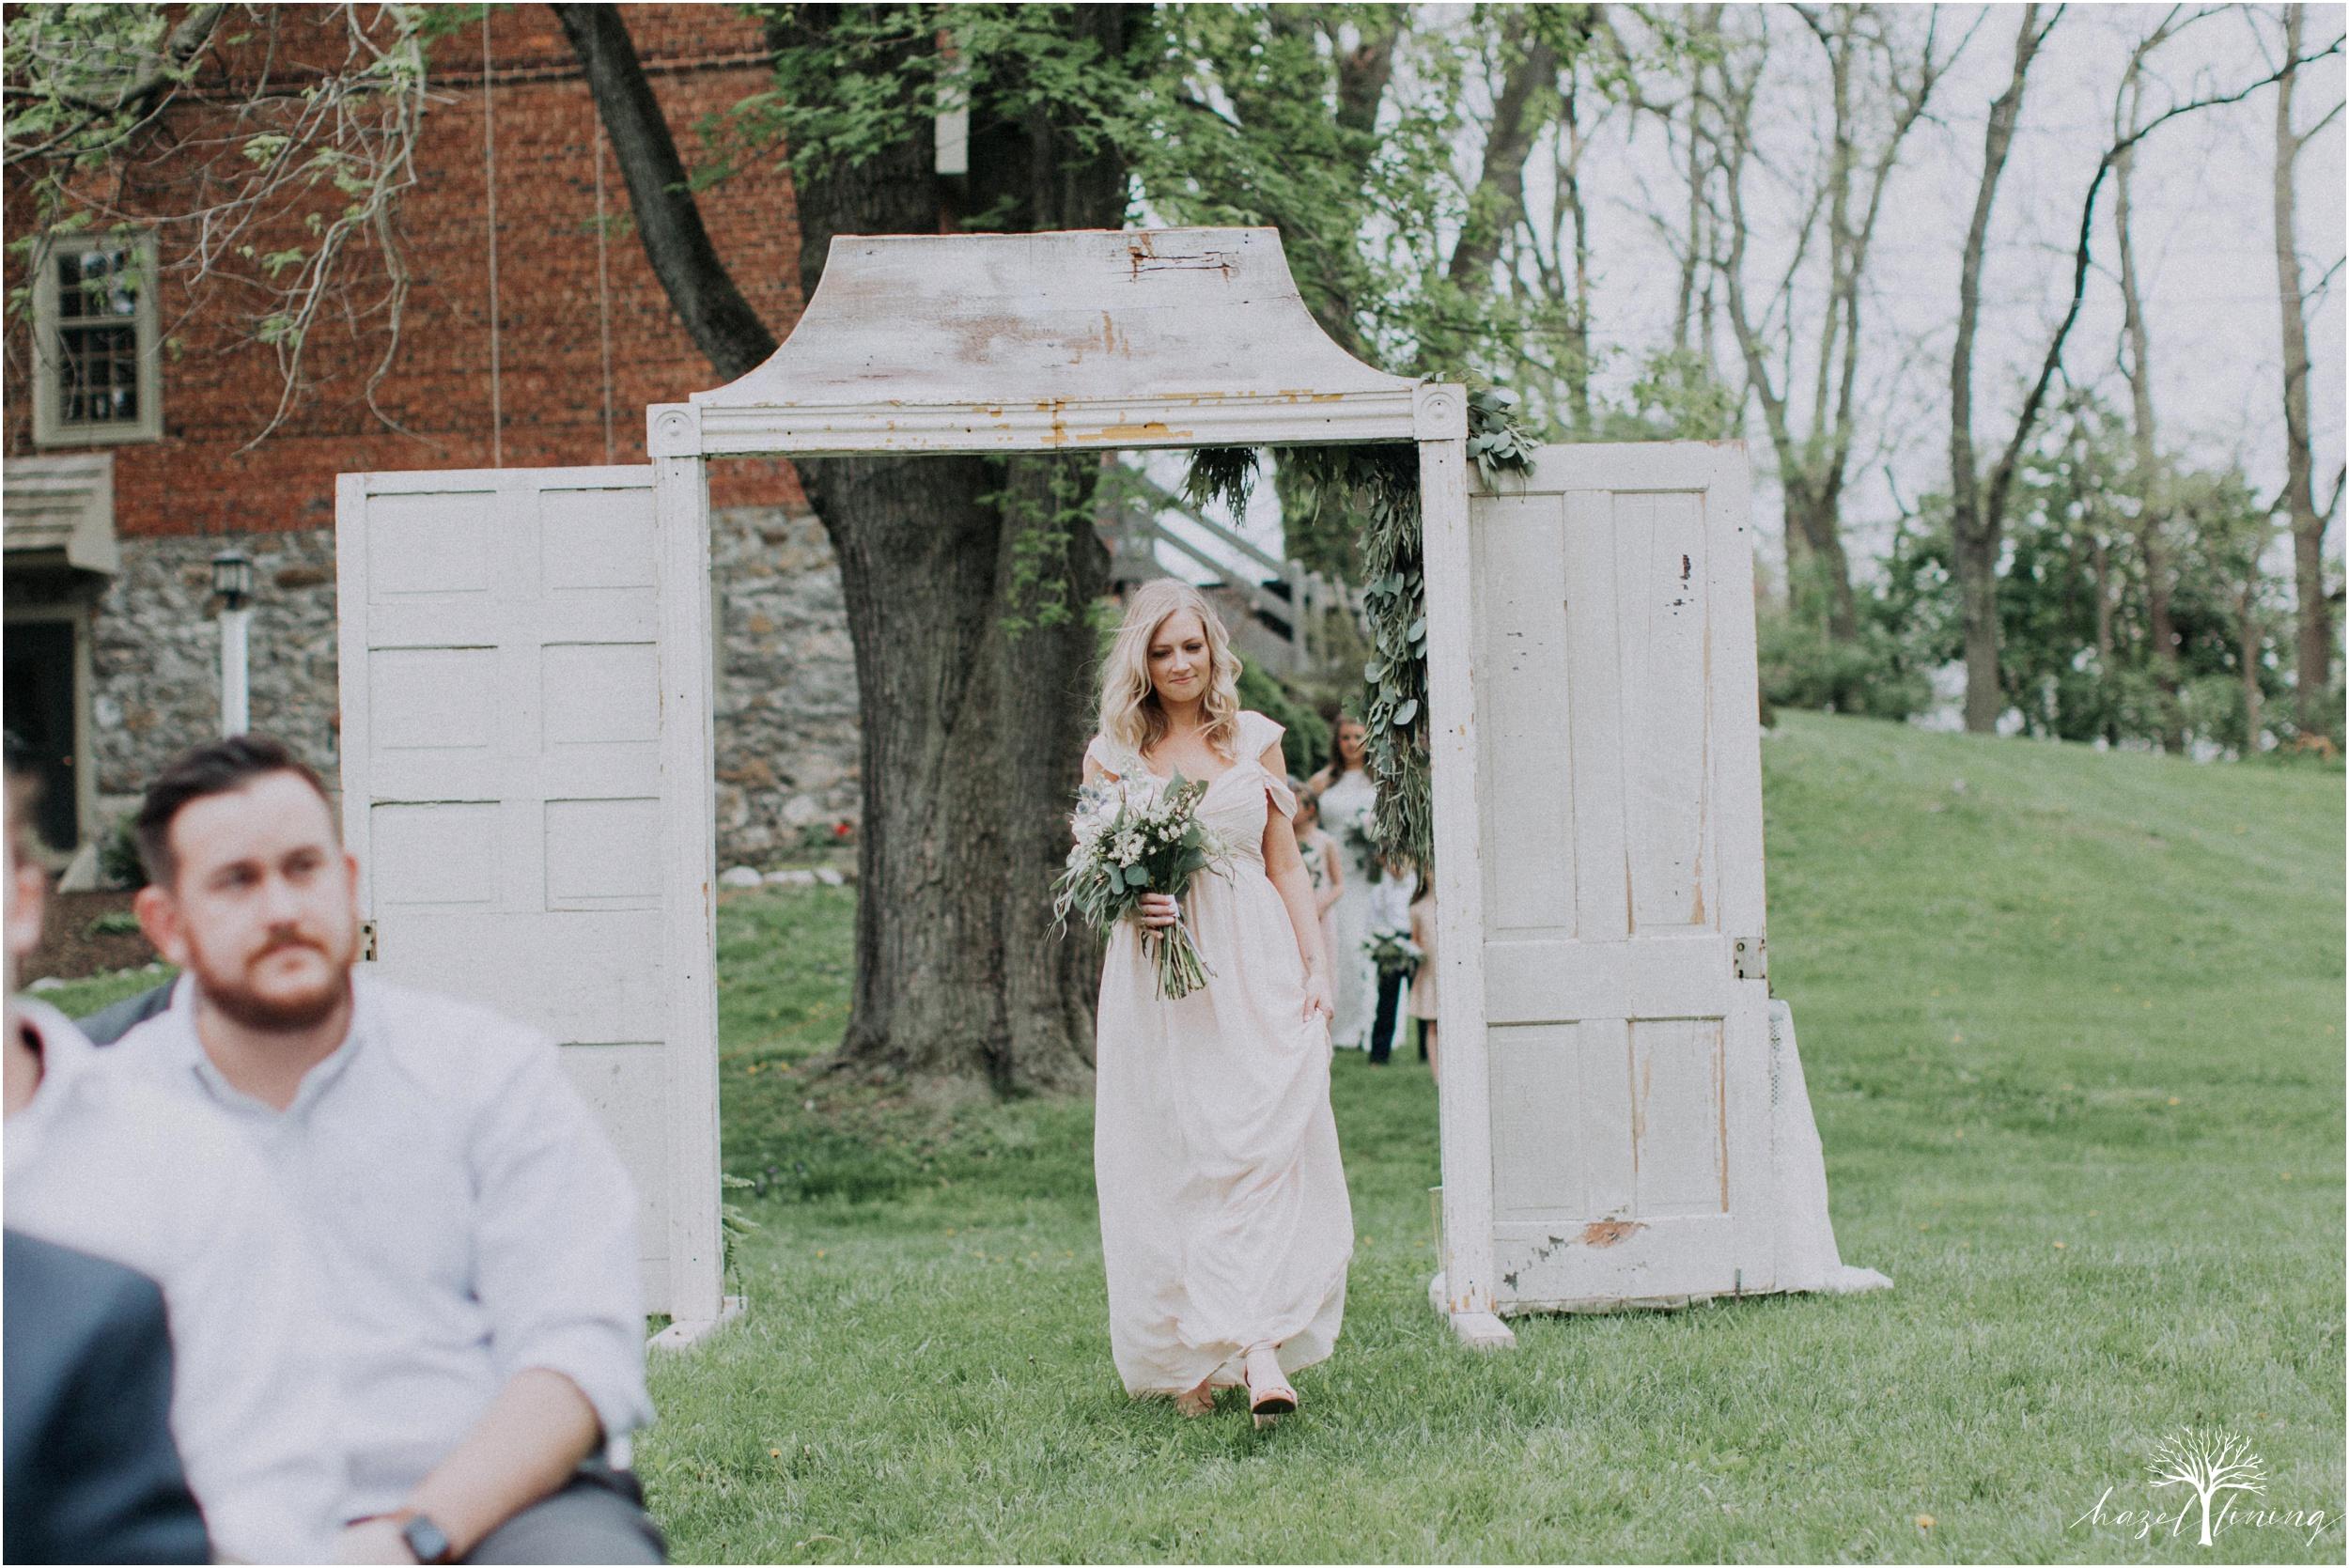 hazel-lining-travel-wedding-elopement-photography-abby-skyler-hunt-the-willis-house-york-pennsylvania-outdoor-estate-wedding_0075.jpg